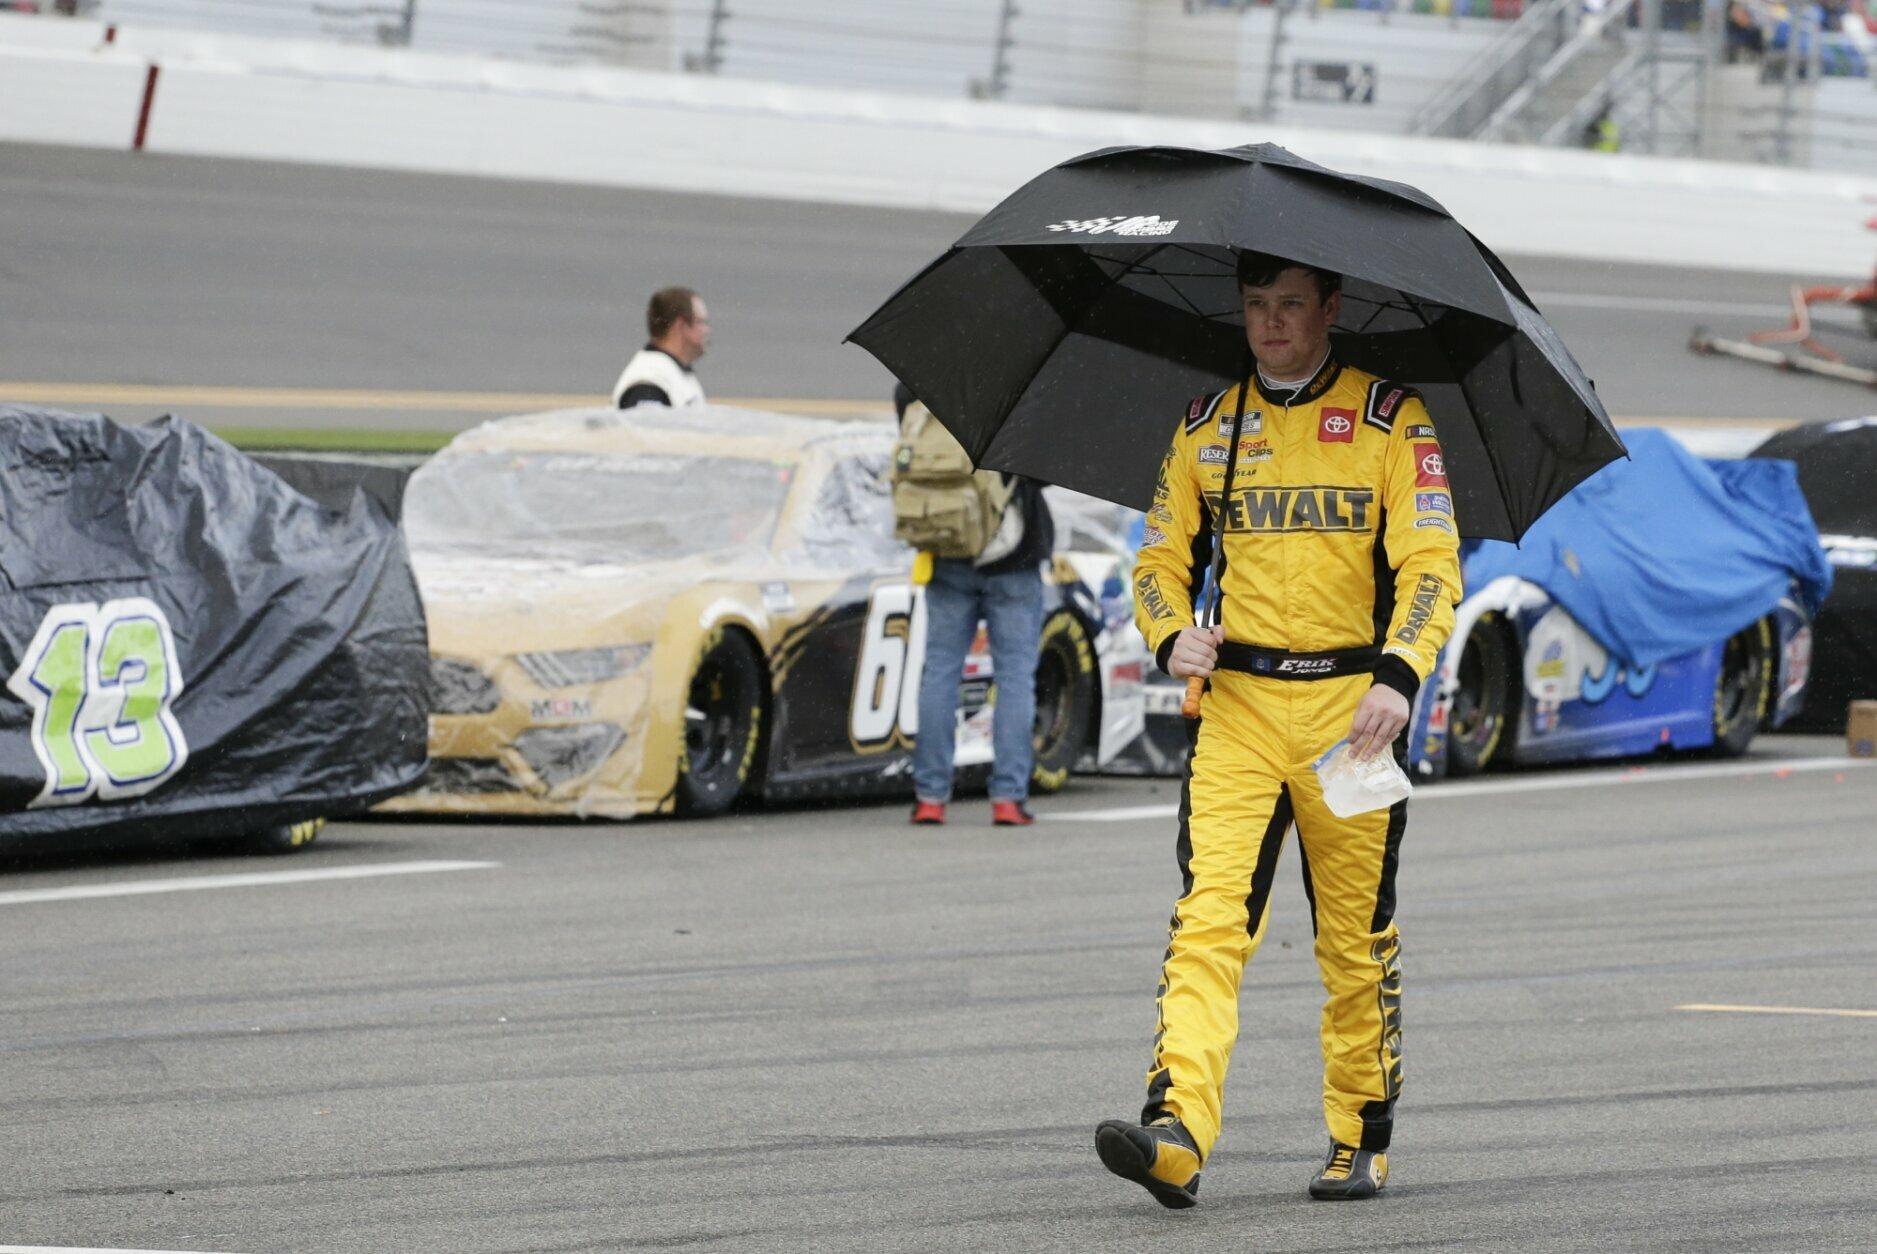 Erik Jones walks down pit road after rain caused a delay in the NASCAR Daytona 500 auto race at Daytona International Speedway, Sunday, Feb. 16, 2020, in Daytona Beach, Fla. (AP Photo/Terry Renna)